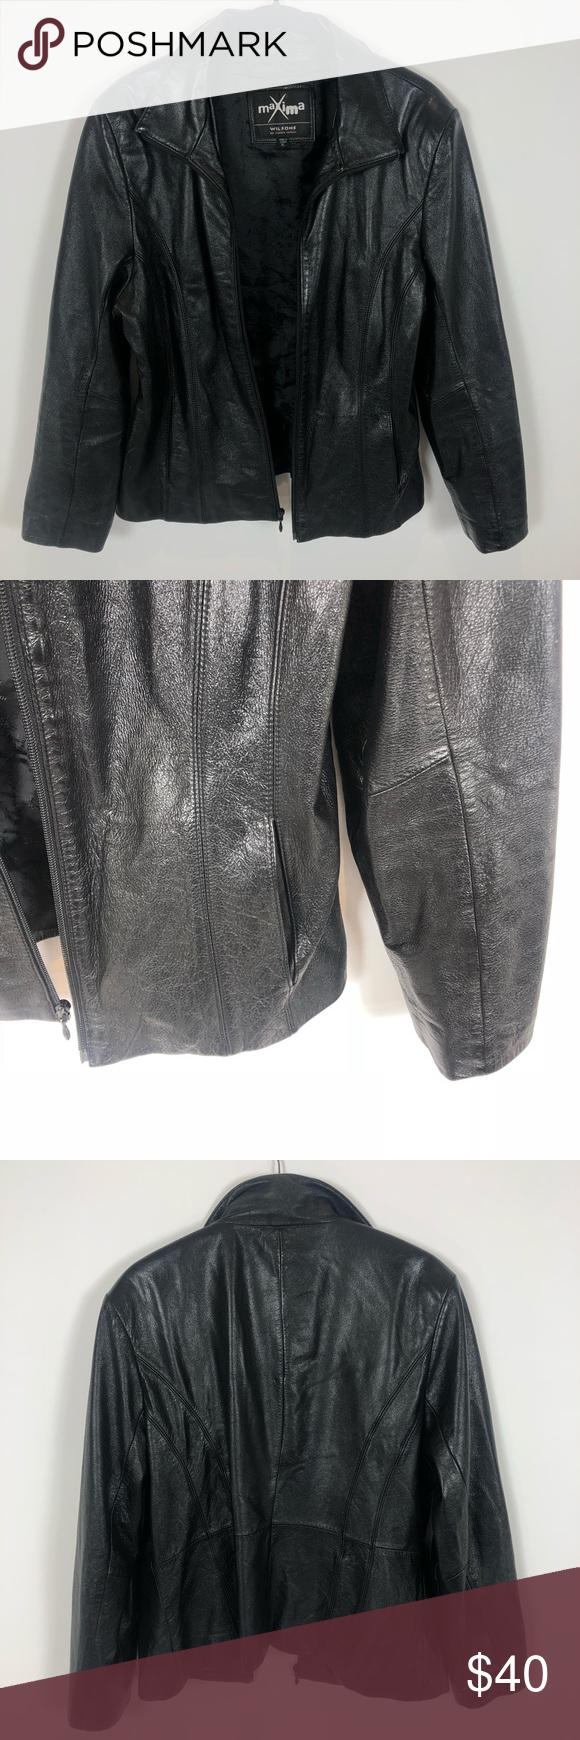 Maxima Wilsons Leather Jacket Maxima Wilsons Leather